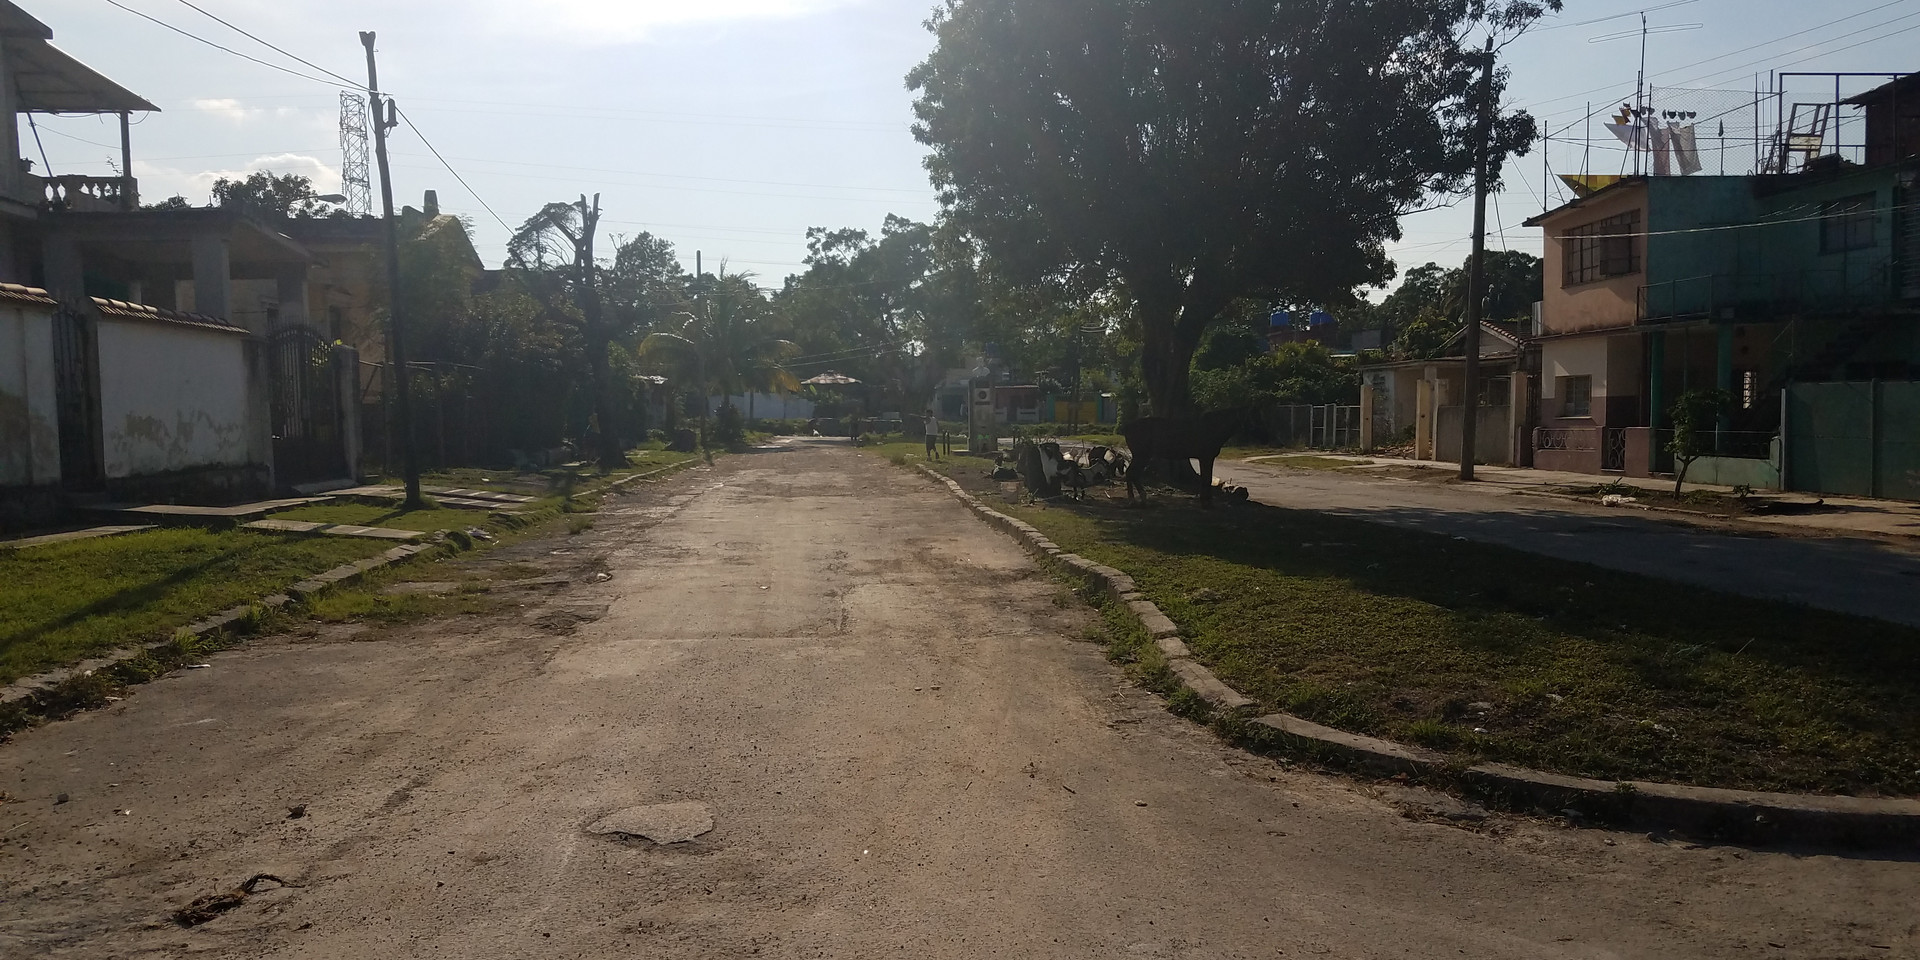 Dirt Road in Havana